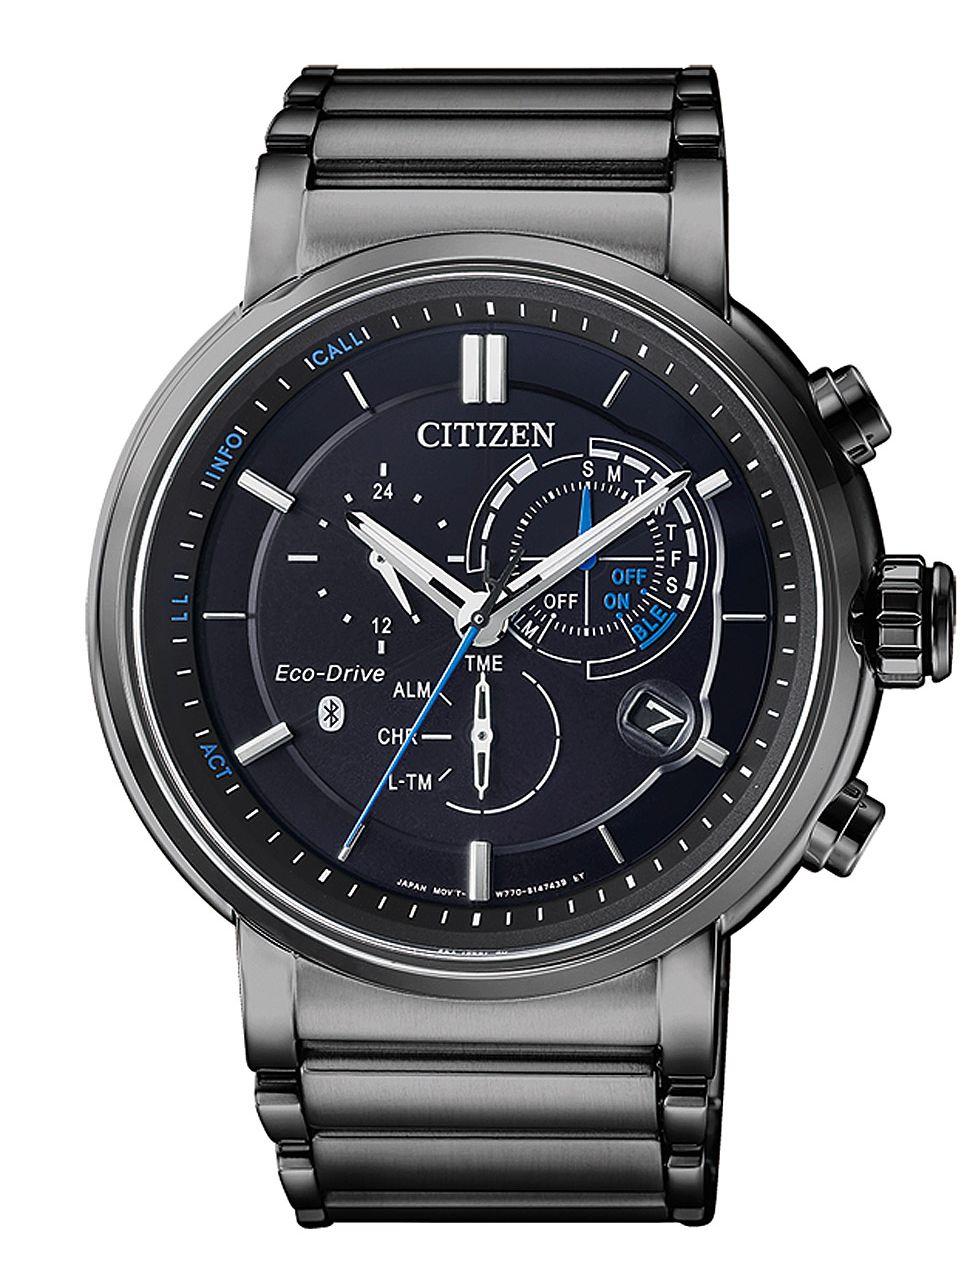 Citizen BZ1006-82E Smartwatch Eco-Drive Bluetooth Mens Watch Image 1 ... 3835ecd3db